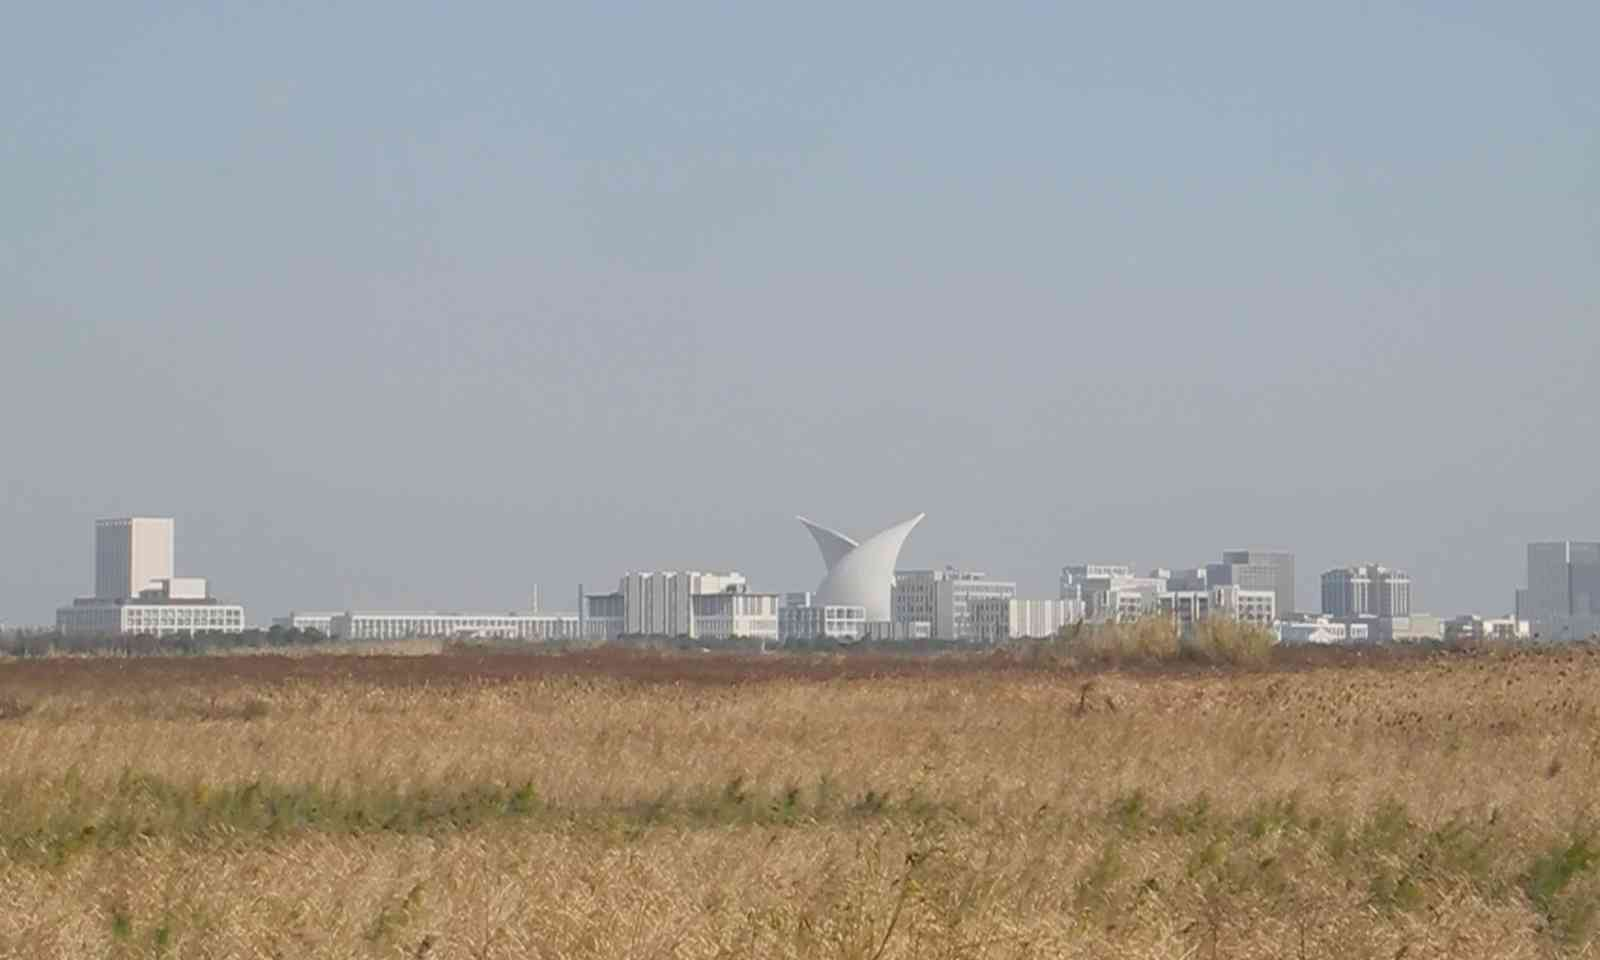 Lingering New City (Wade Shepard)